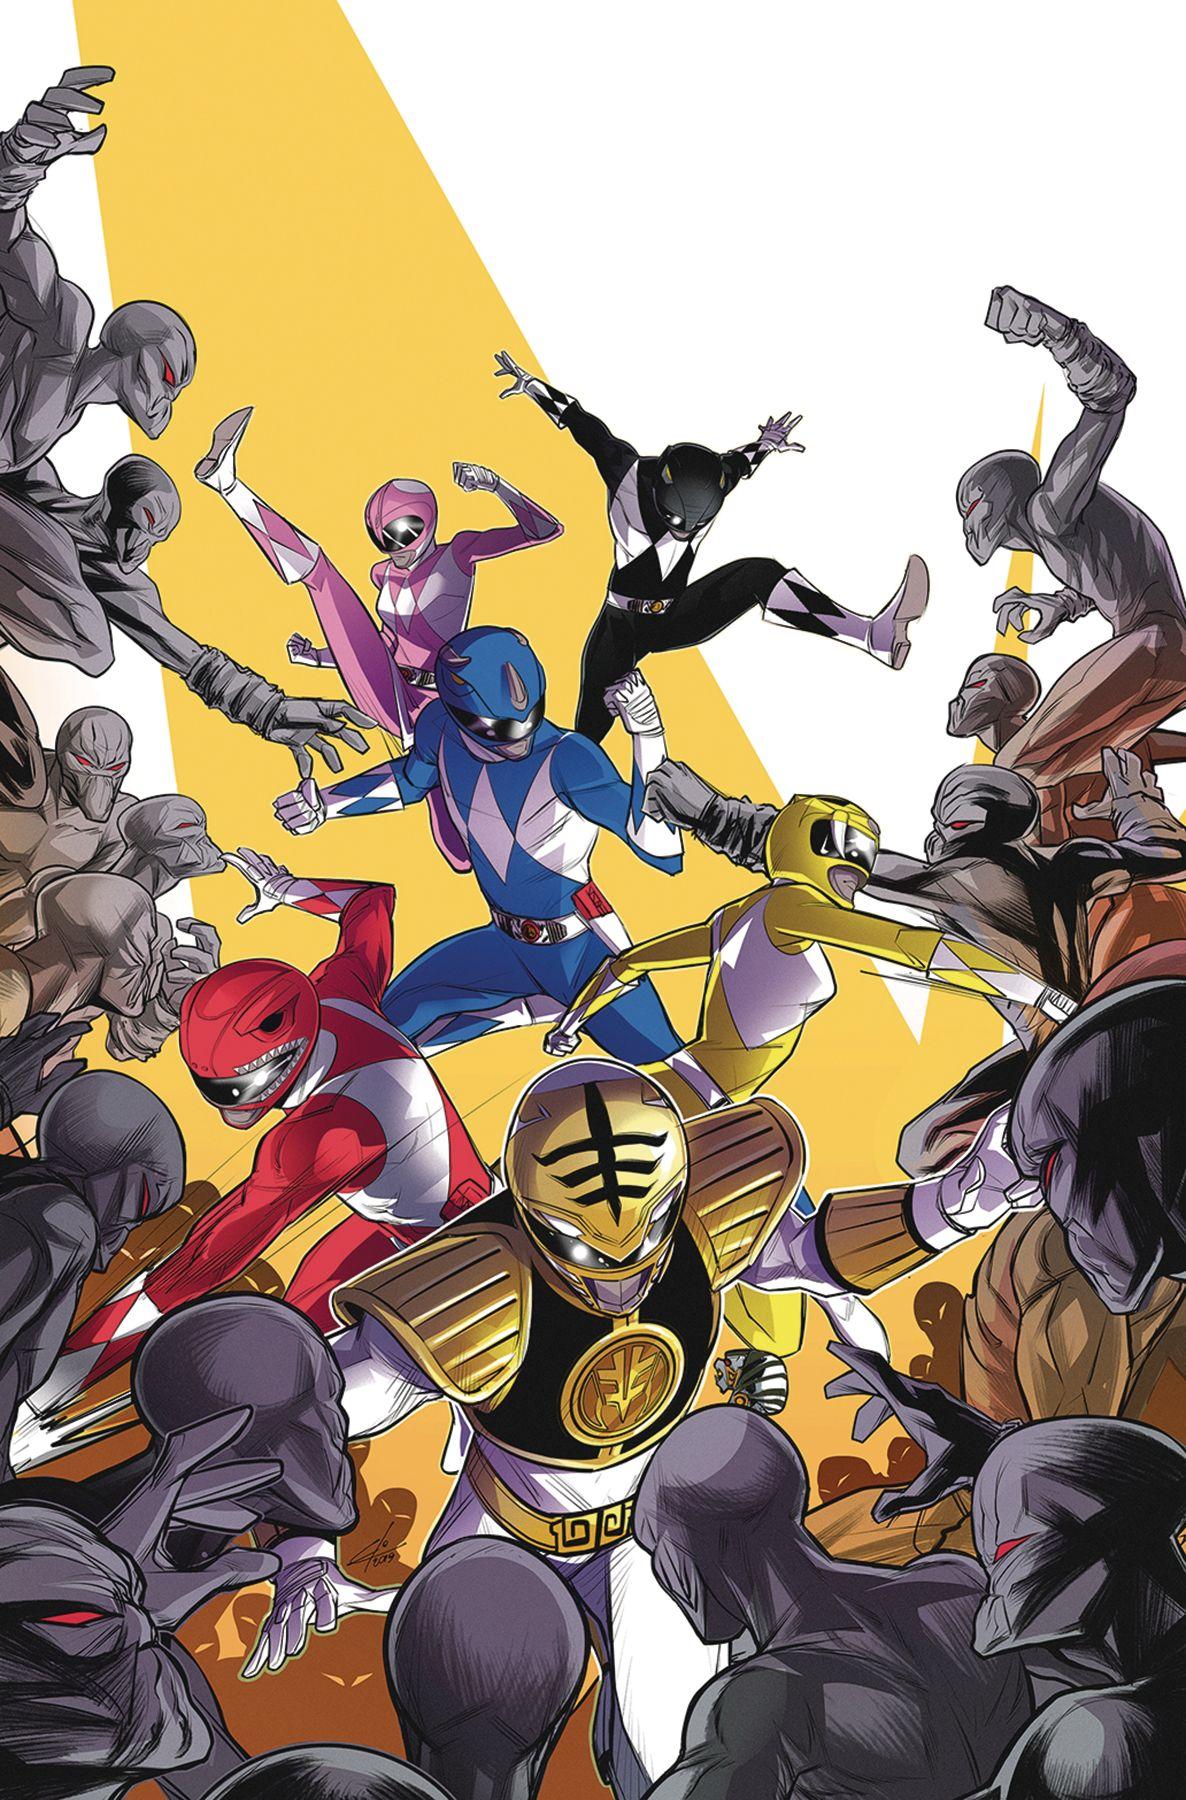 Art By Eleonora Carlini Slab City Comics Uk Comic Shop Specialising In Exclusive Variants Power Rangers Now Power Rangers Ranger